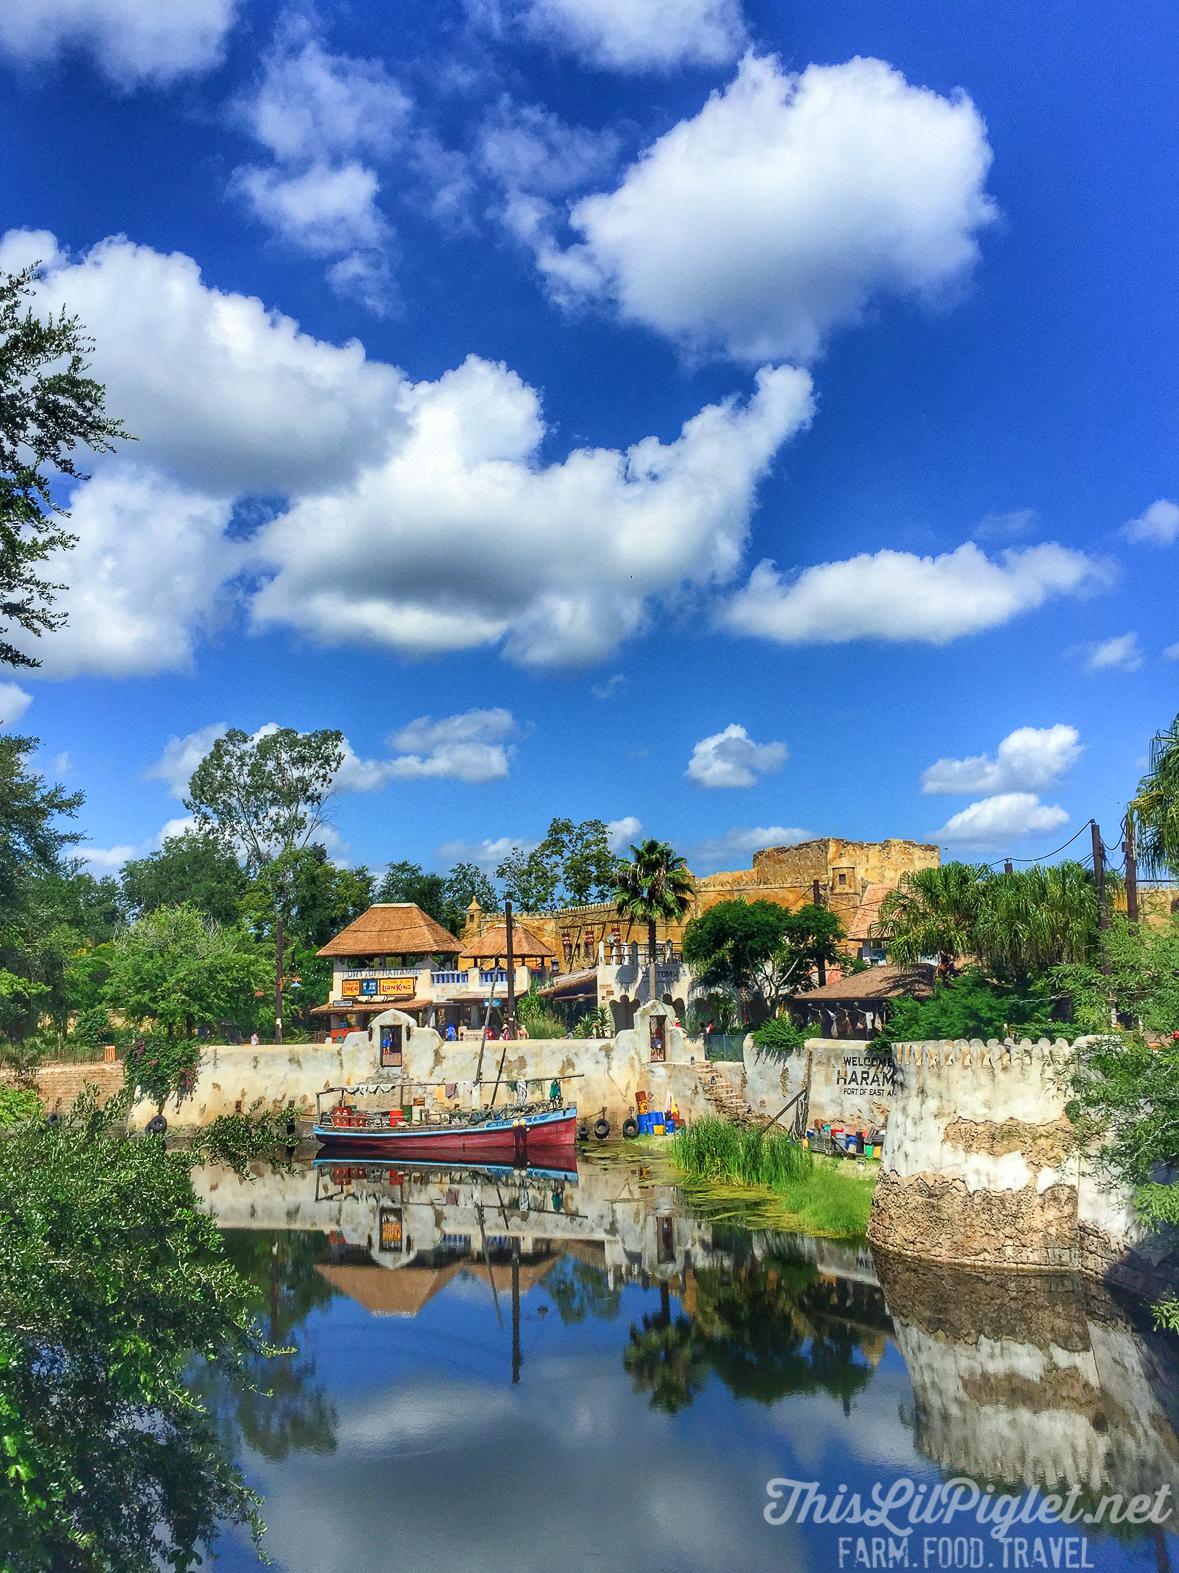 Walt Disney World Disney's Animal Kingdom Asia Kali River Rapids // thislilpiglet.net